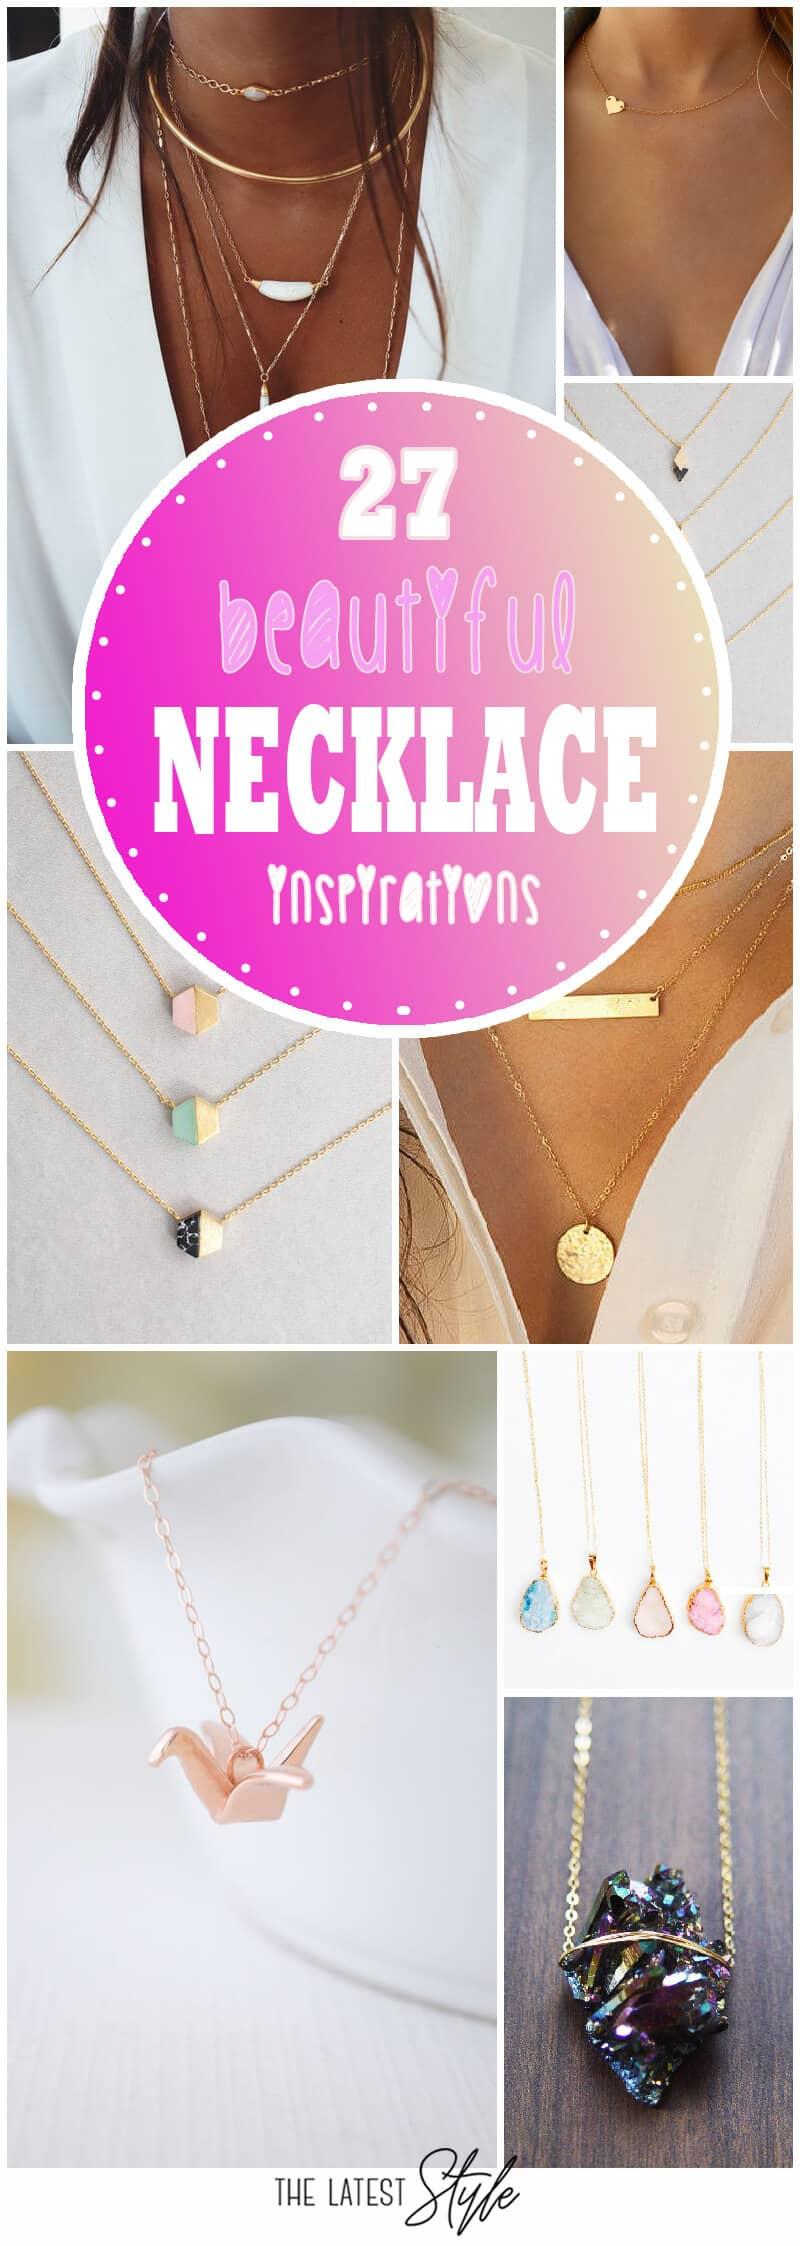 27 Beautiful Necklace Inspirations